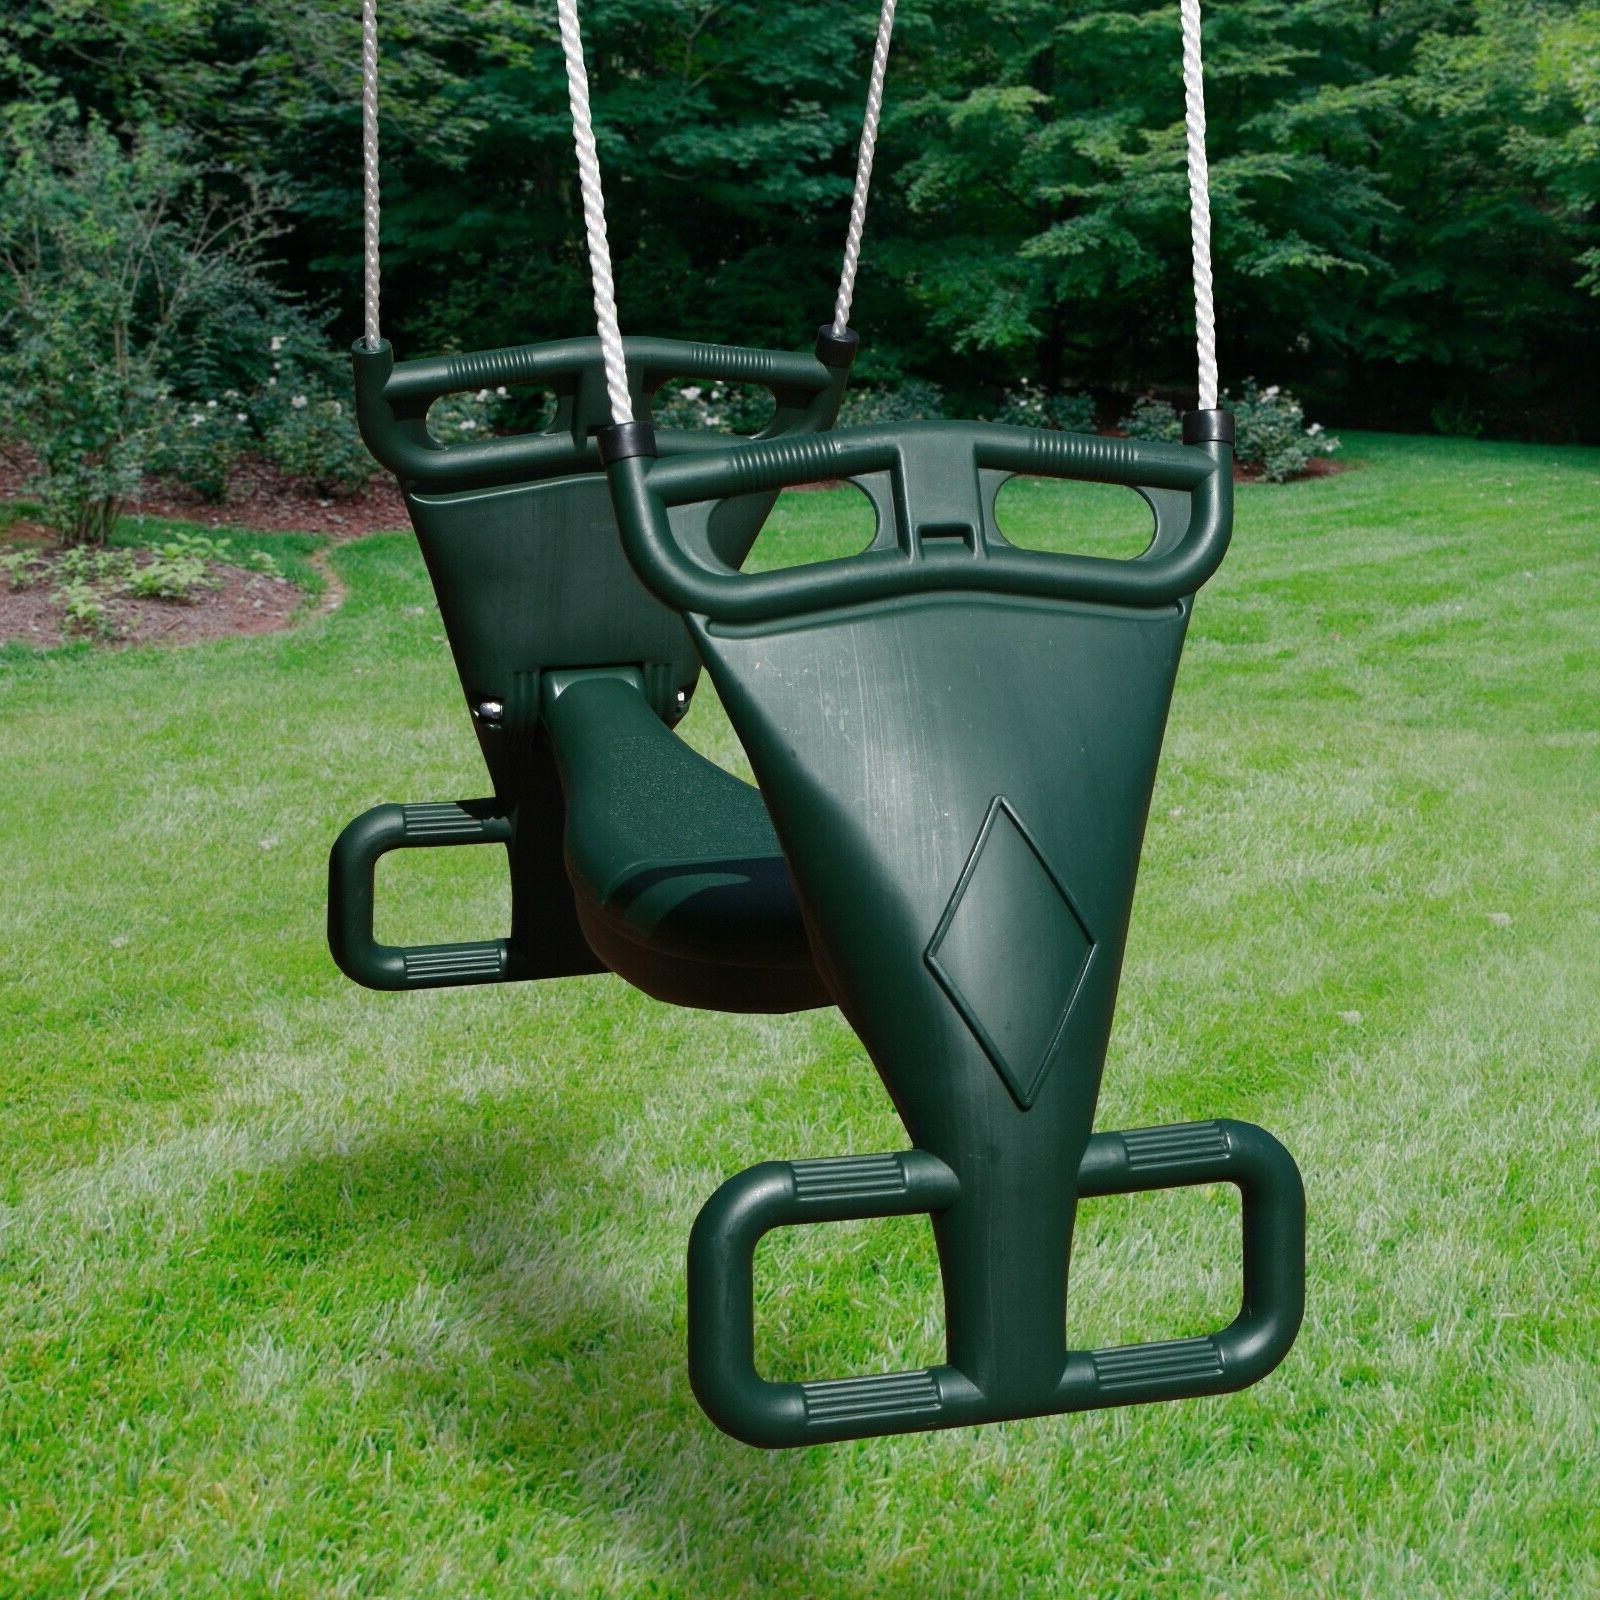 tandem swing outdoor play children backyard plastic